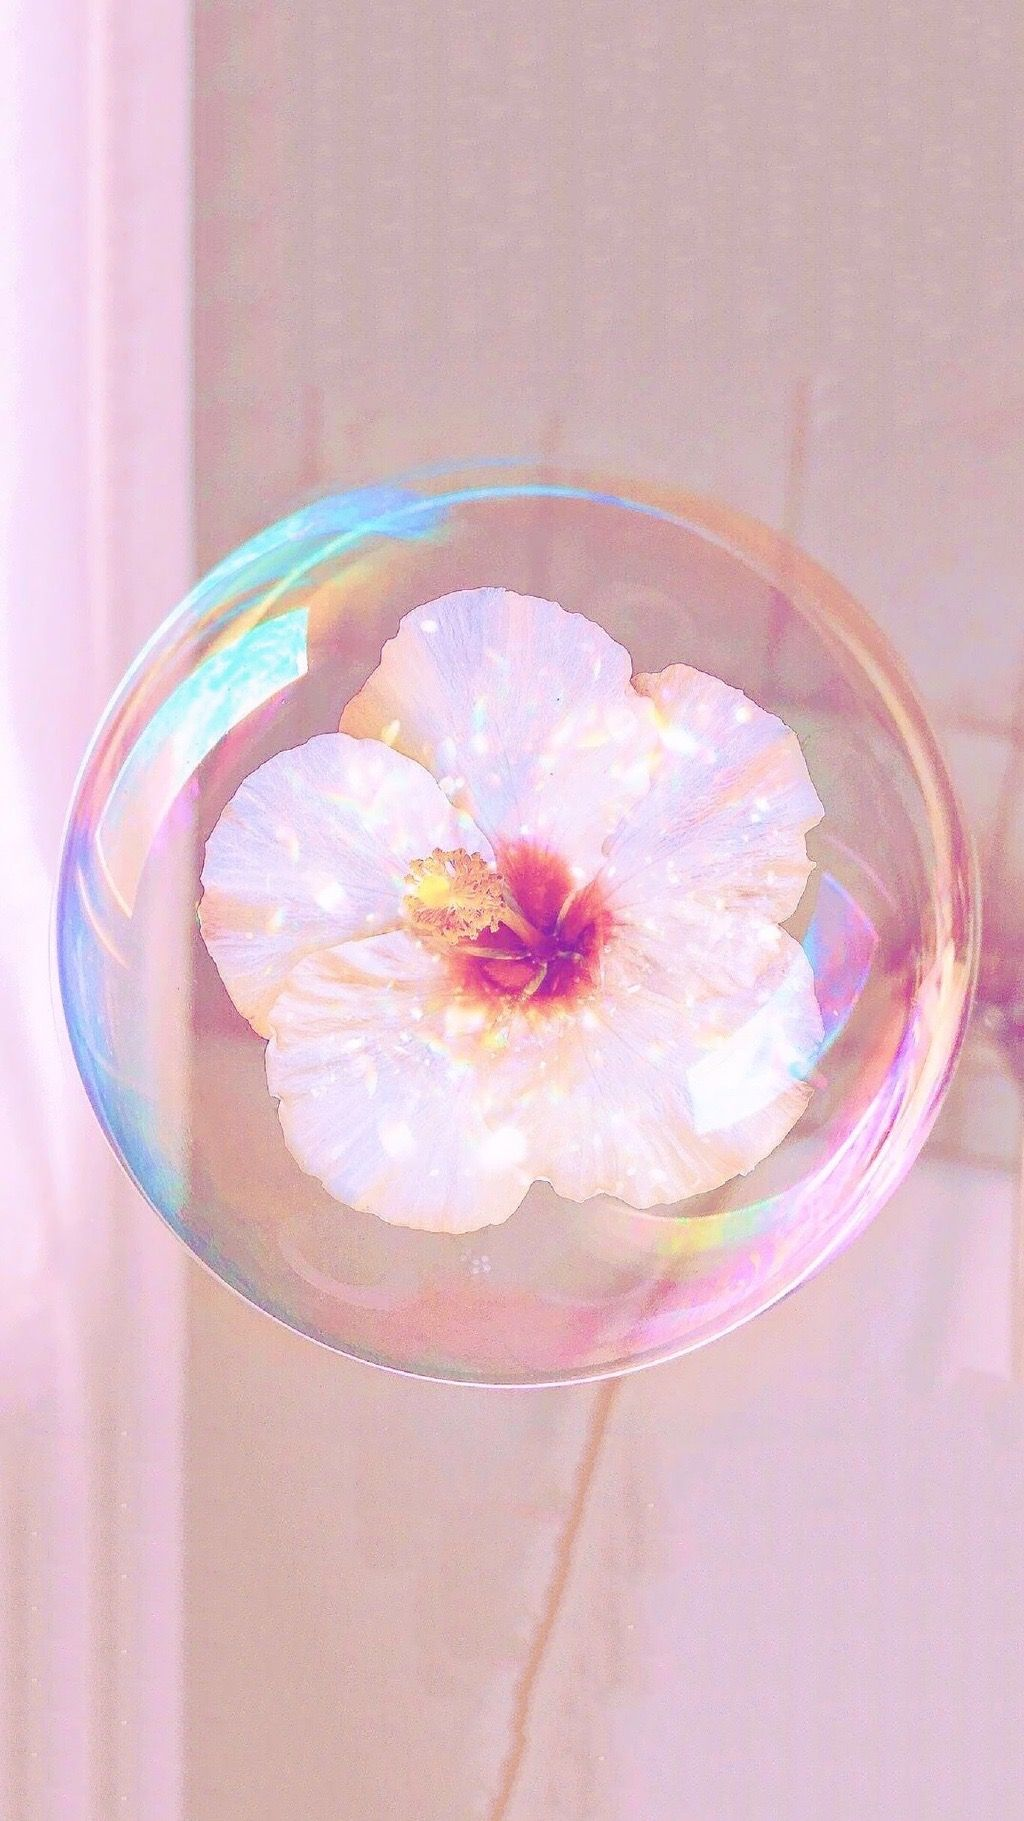 Bubble Gum Kisses Aesthetic Pastel Wallpaper Pink Wallpaper Iphone Beautiful Wallpapers